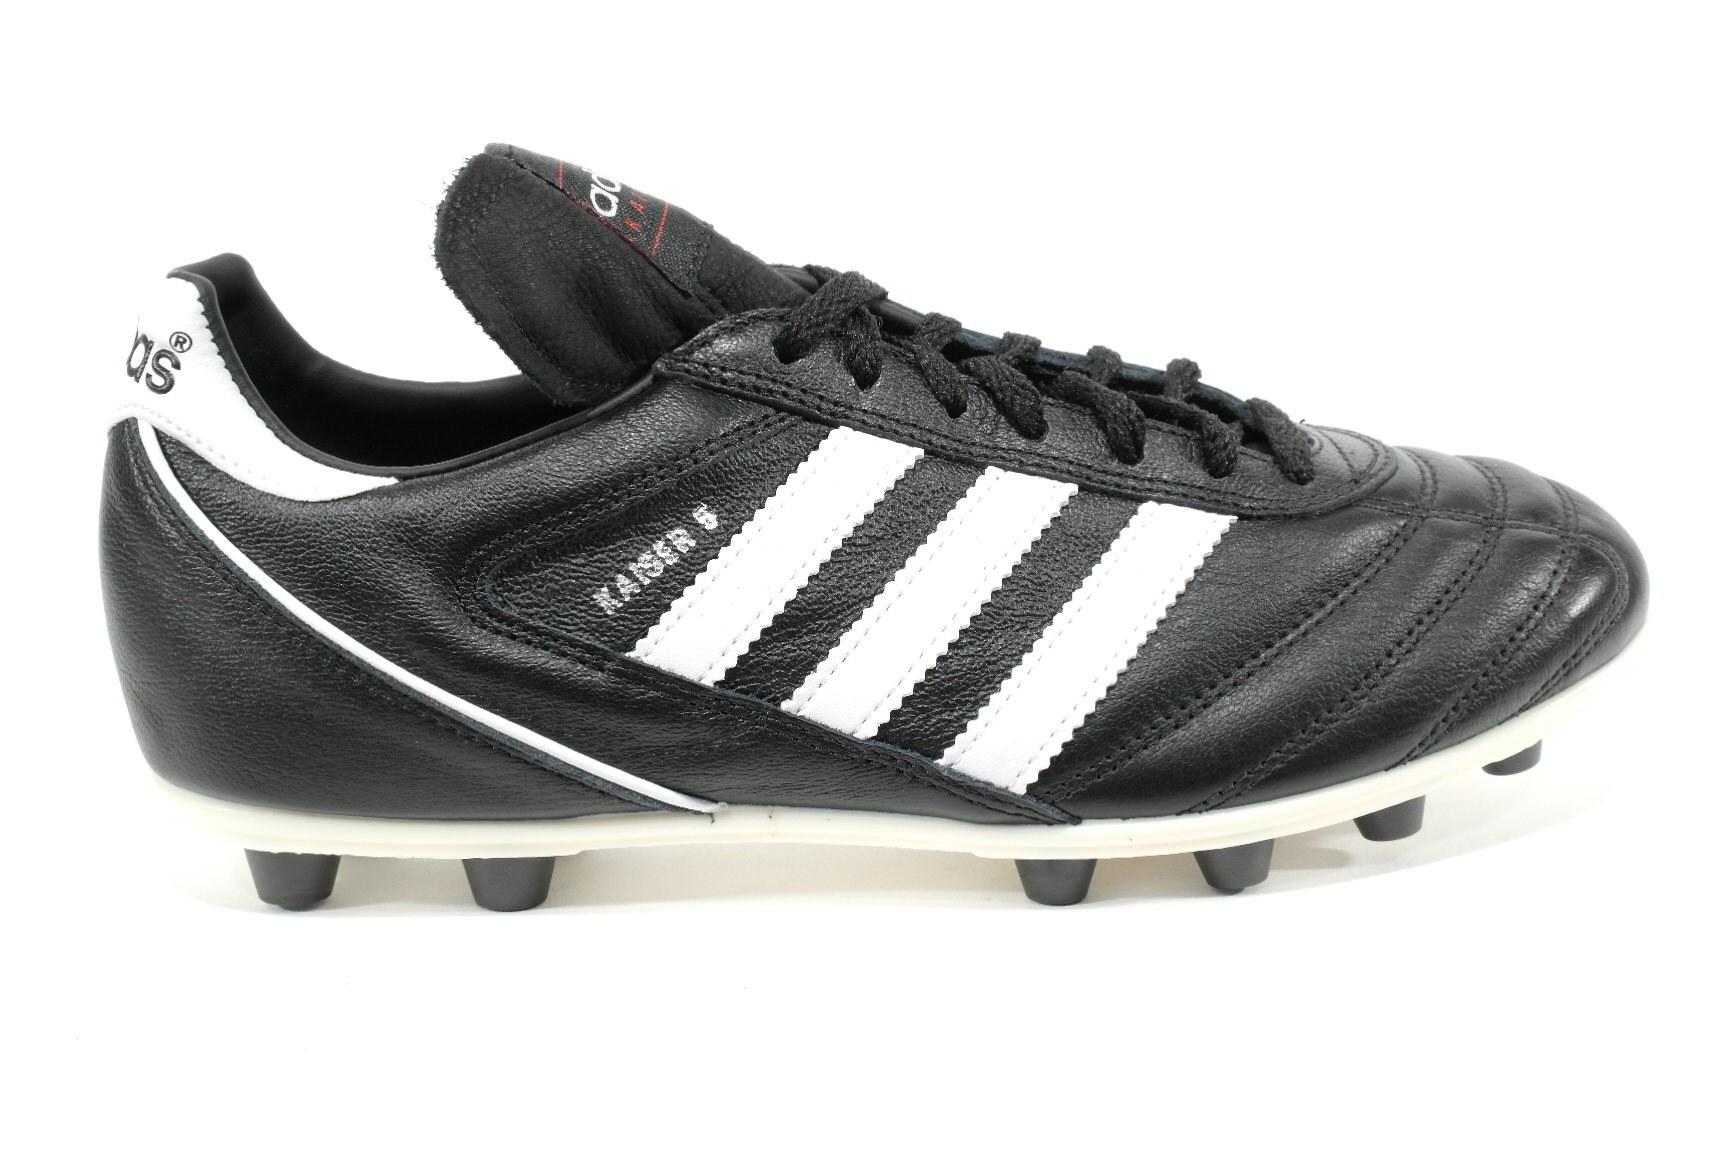 Adidas Kaiser Liga voetbalschoenen